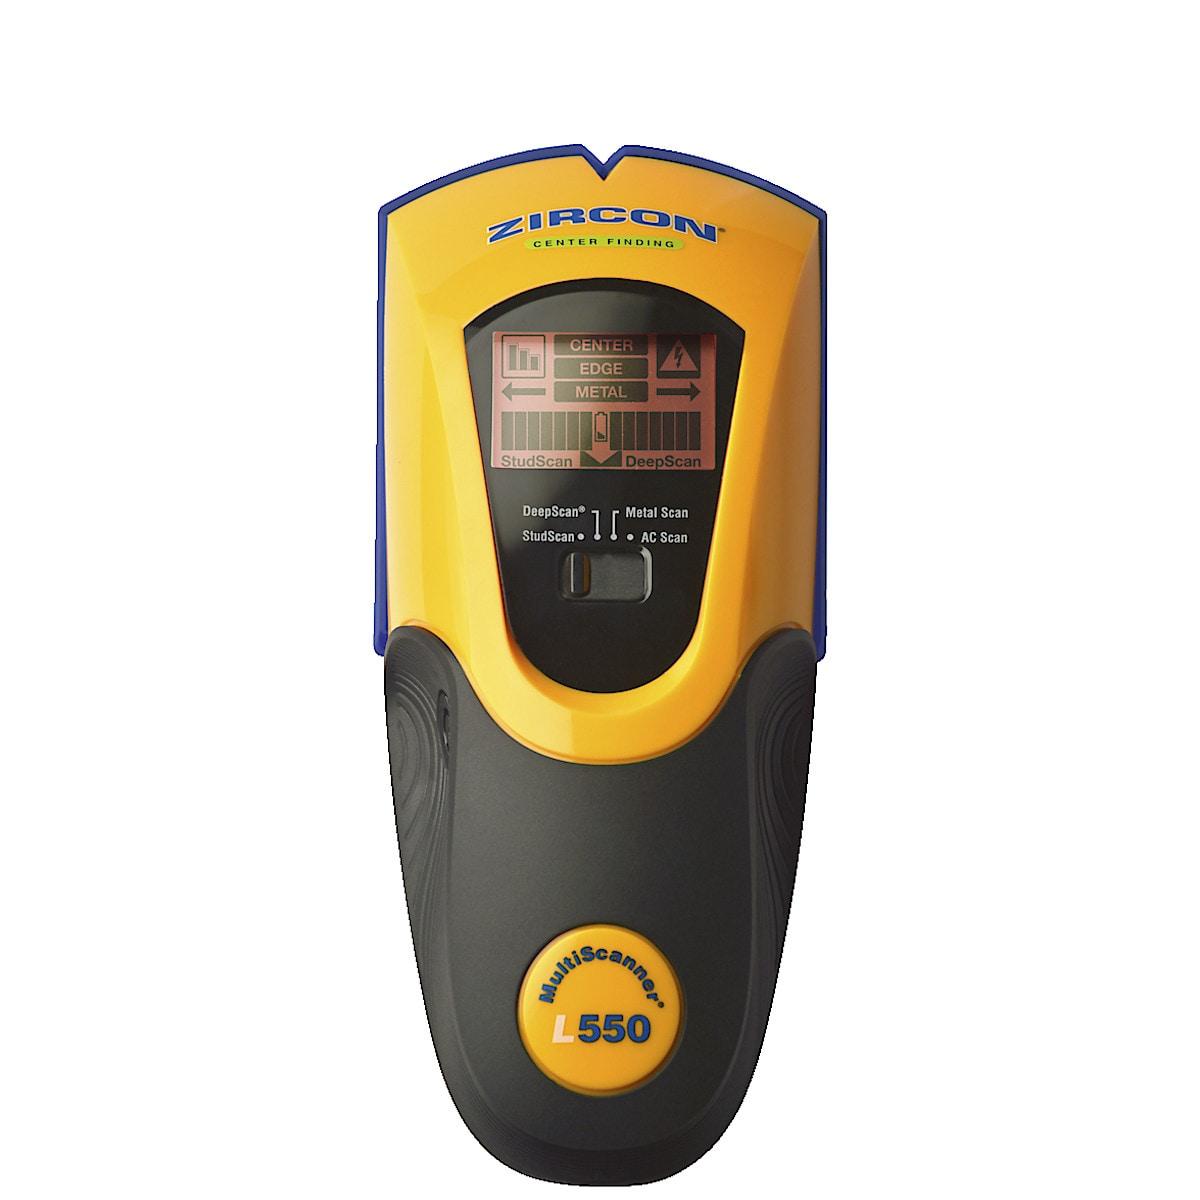 Multidetektor Zircon L550 OneStep